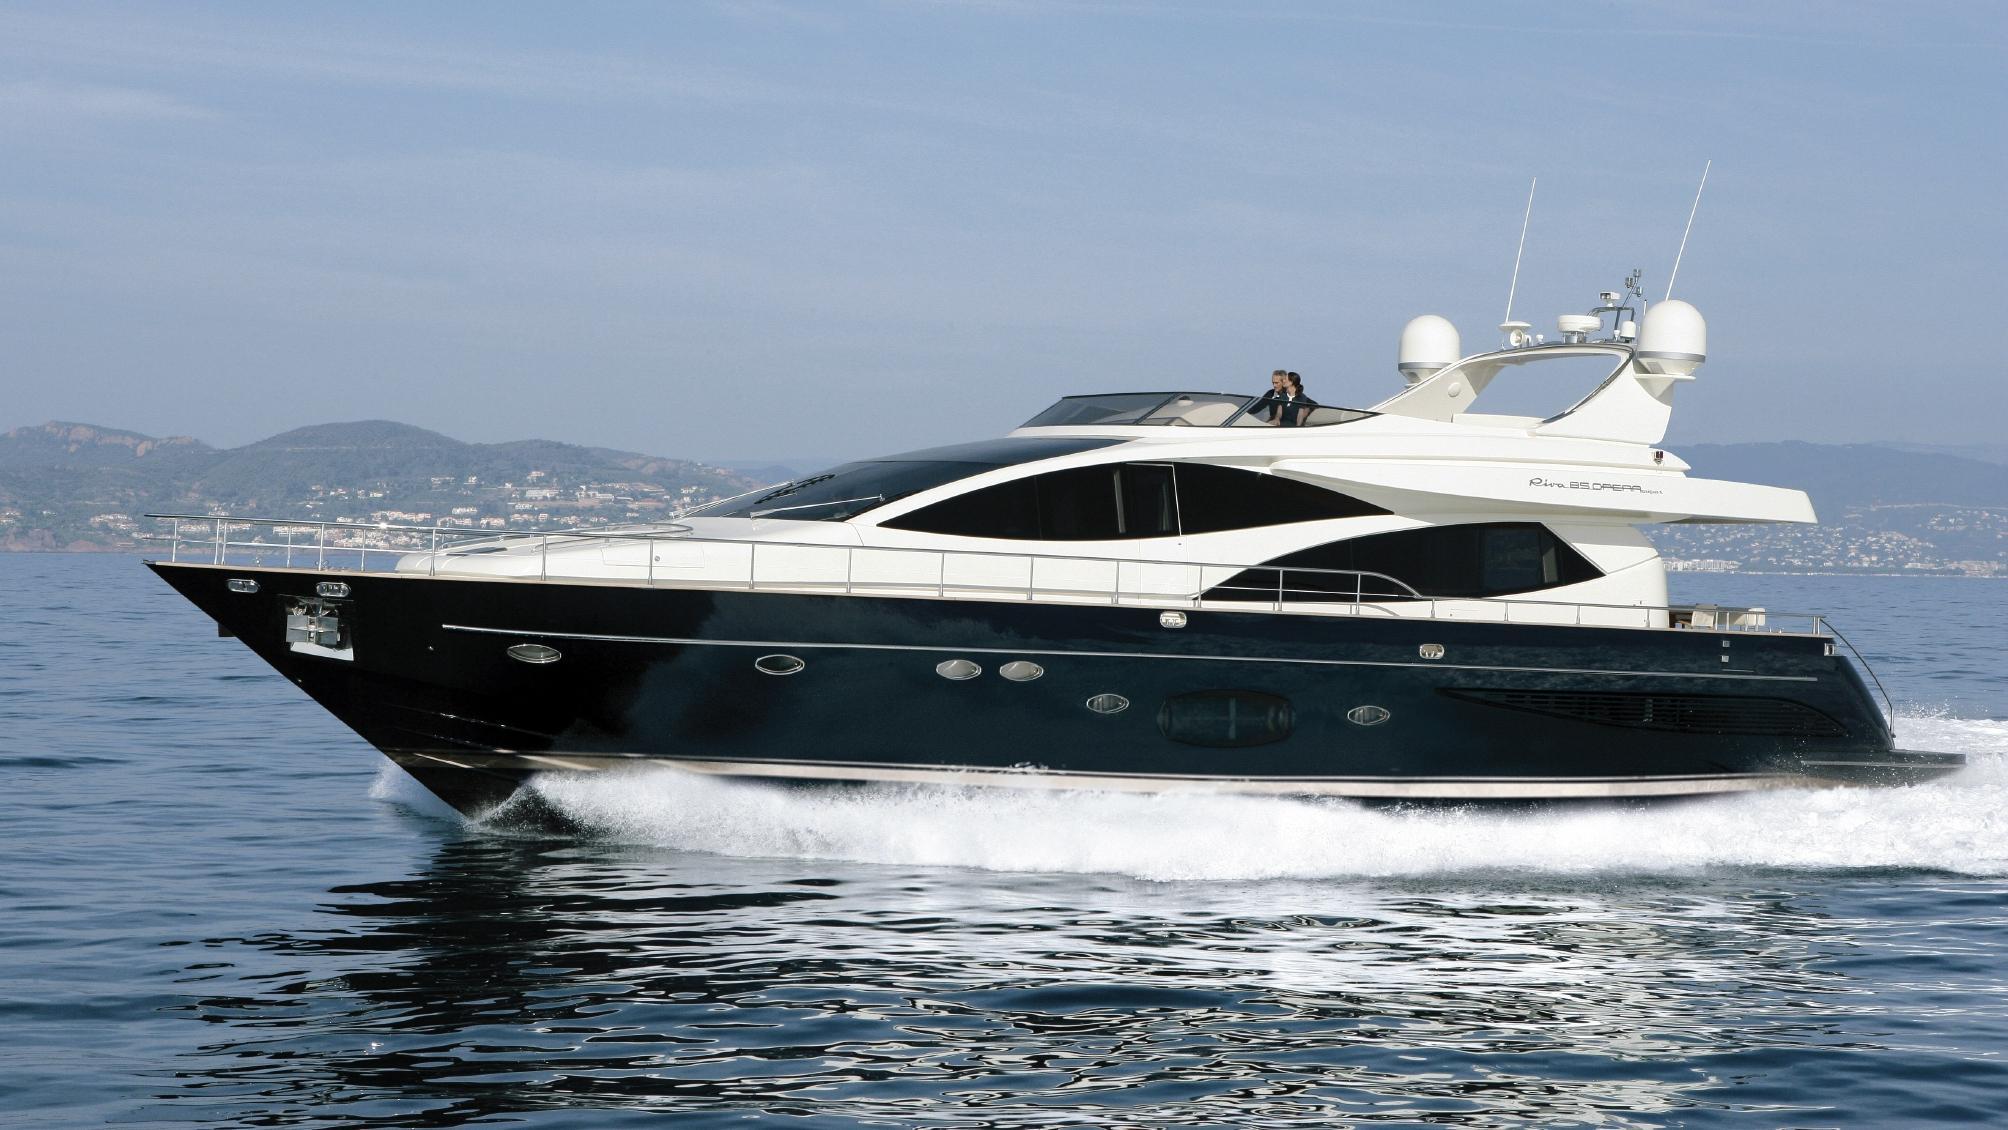 riva-opera-85-15-motor-yacht-2007-26m-cruising